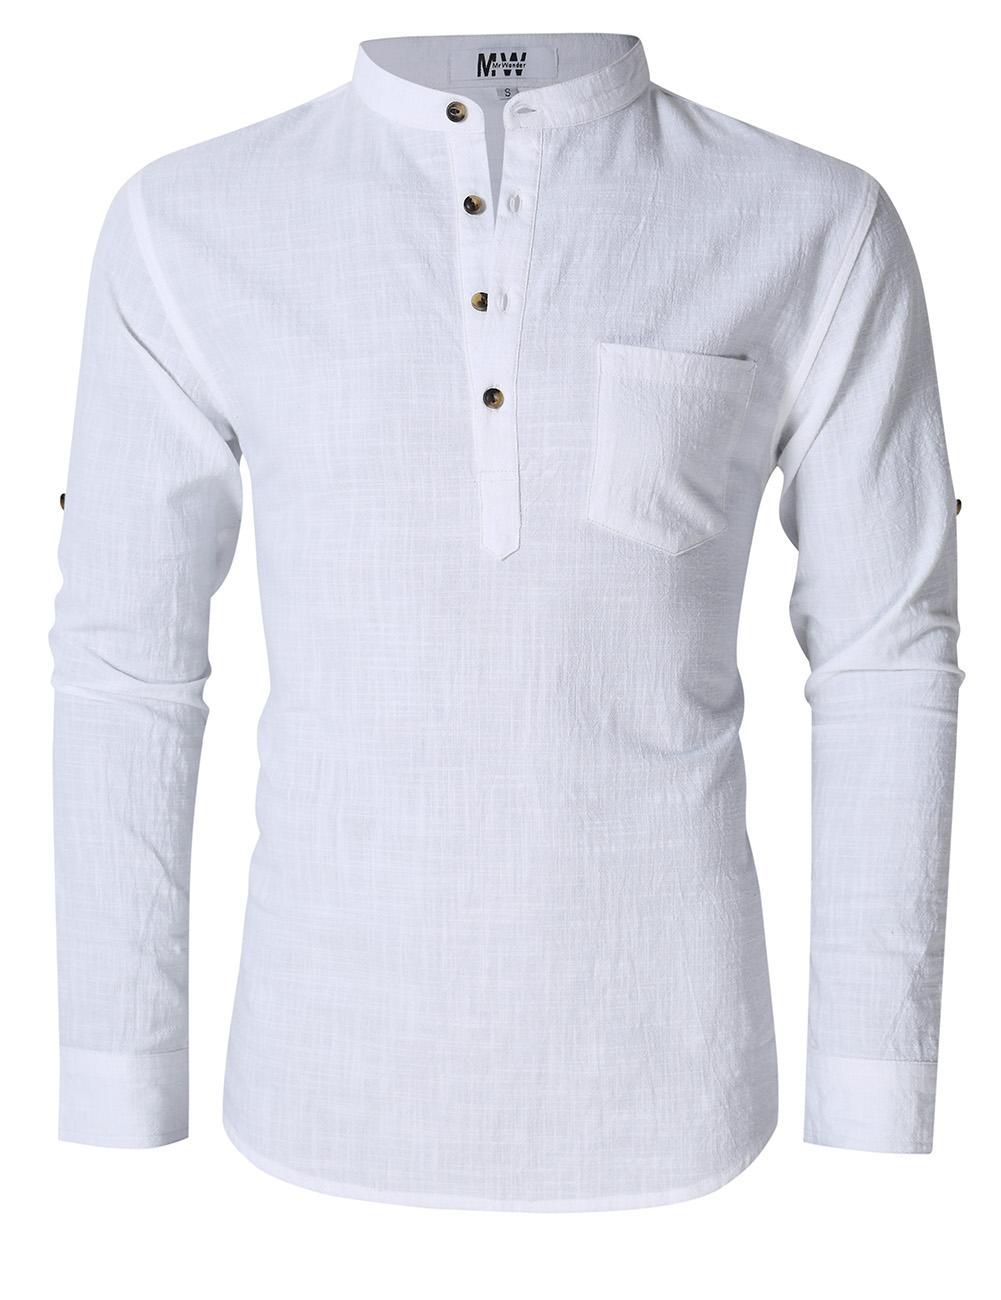 MrWonder Men's Casual Slim Fit Henley Neck Long Sleeve Linen Shirt White_2XL